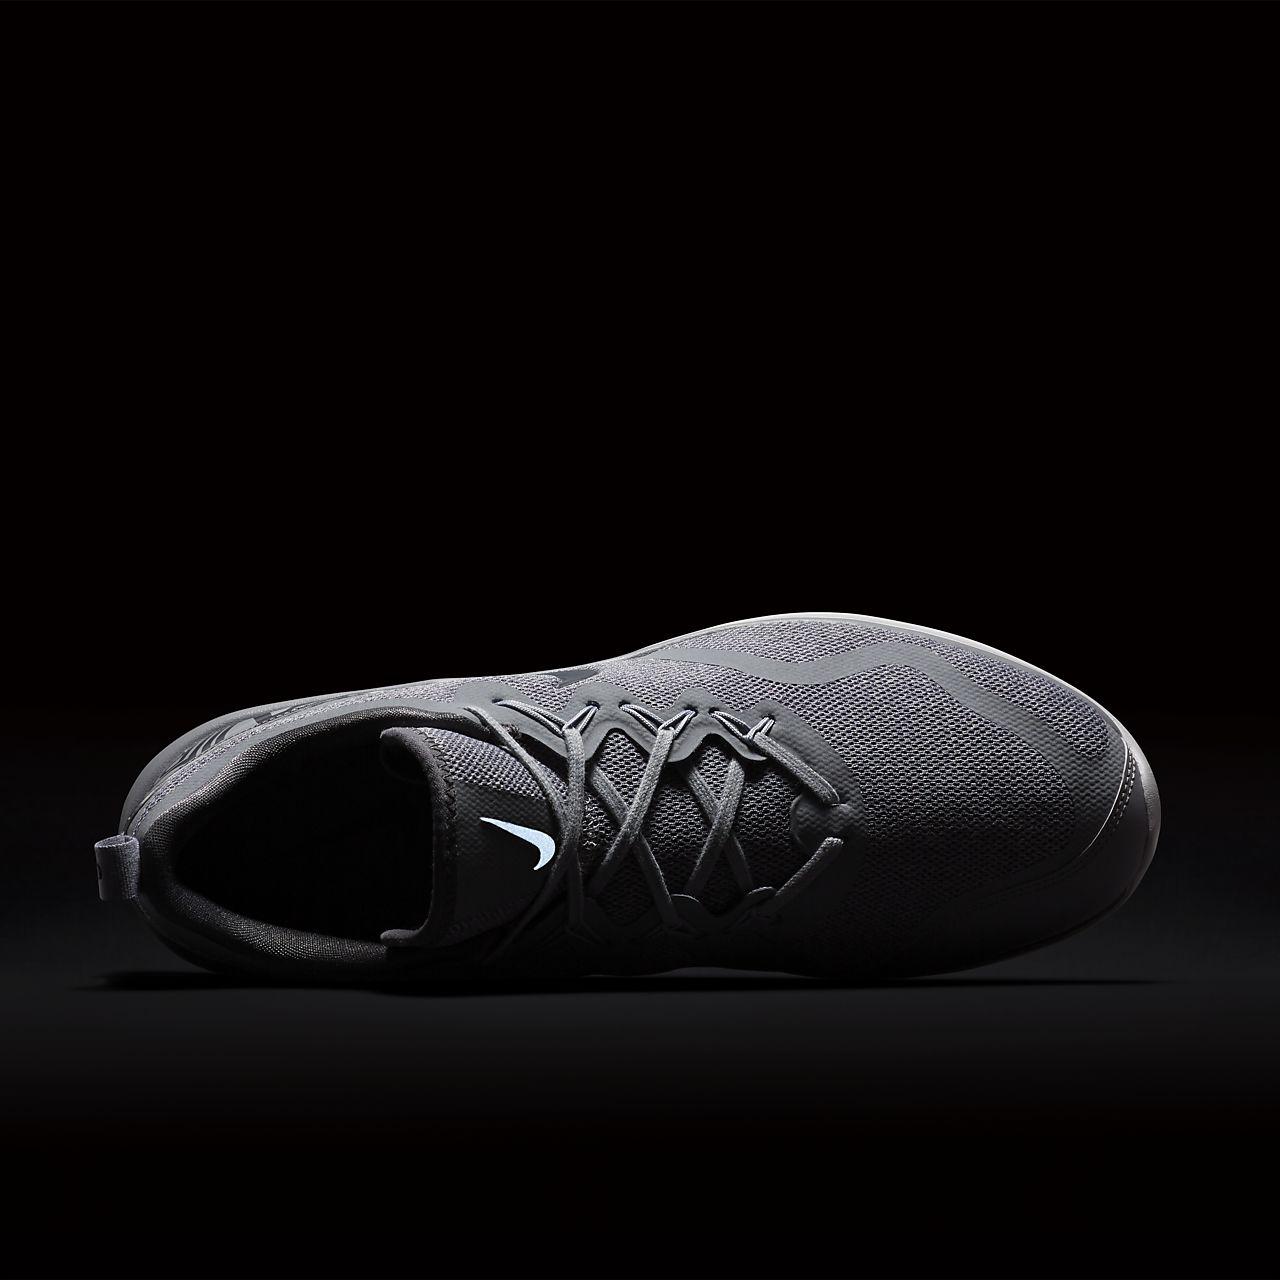 5d5d917e034 Nike Air Max Fury Men s Running Shoe. Nike.com AU